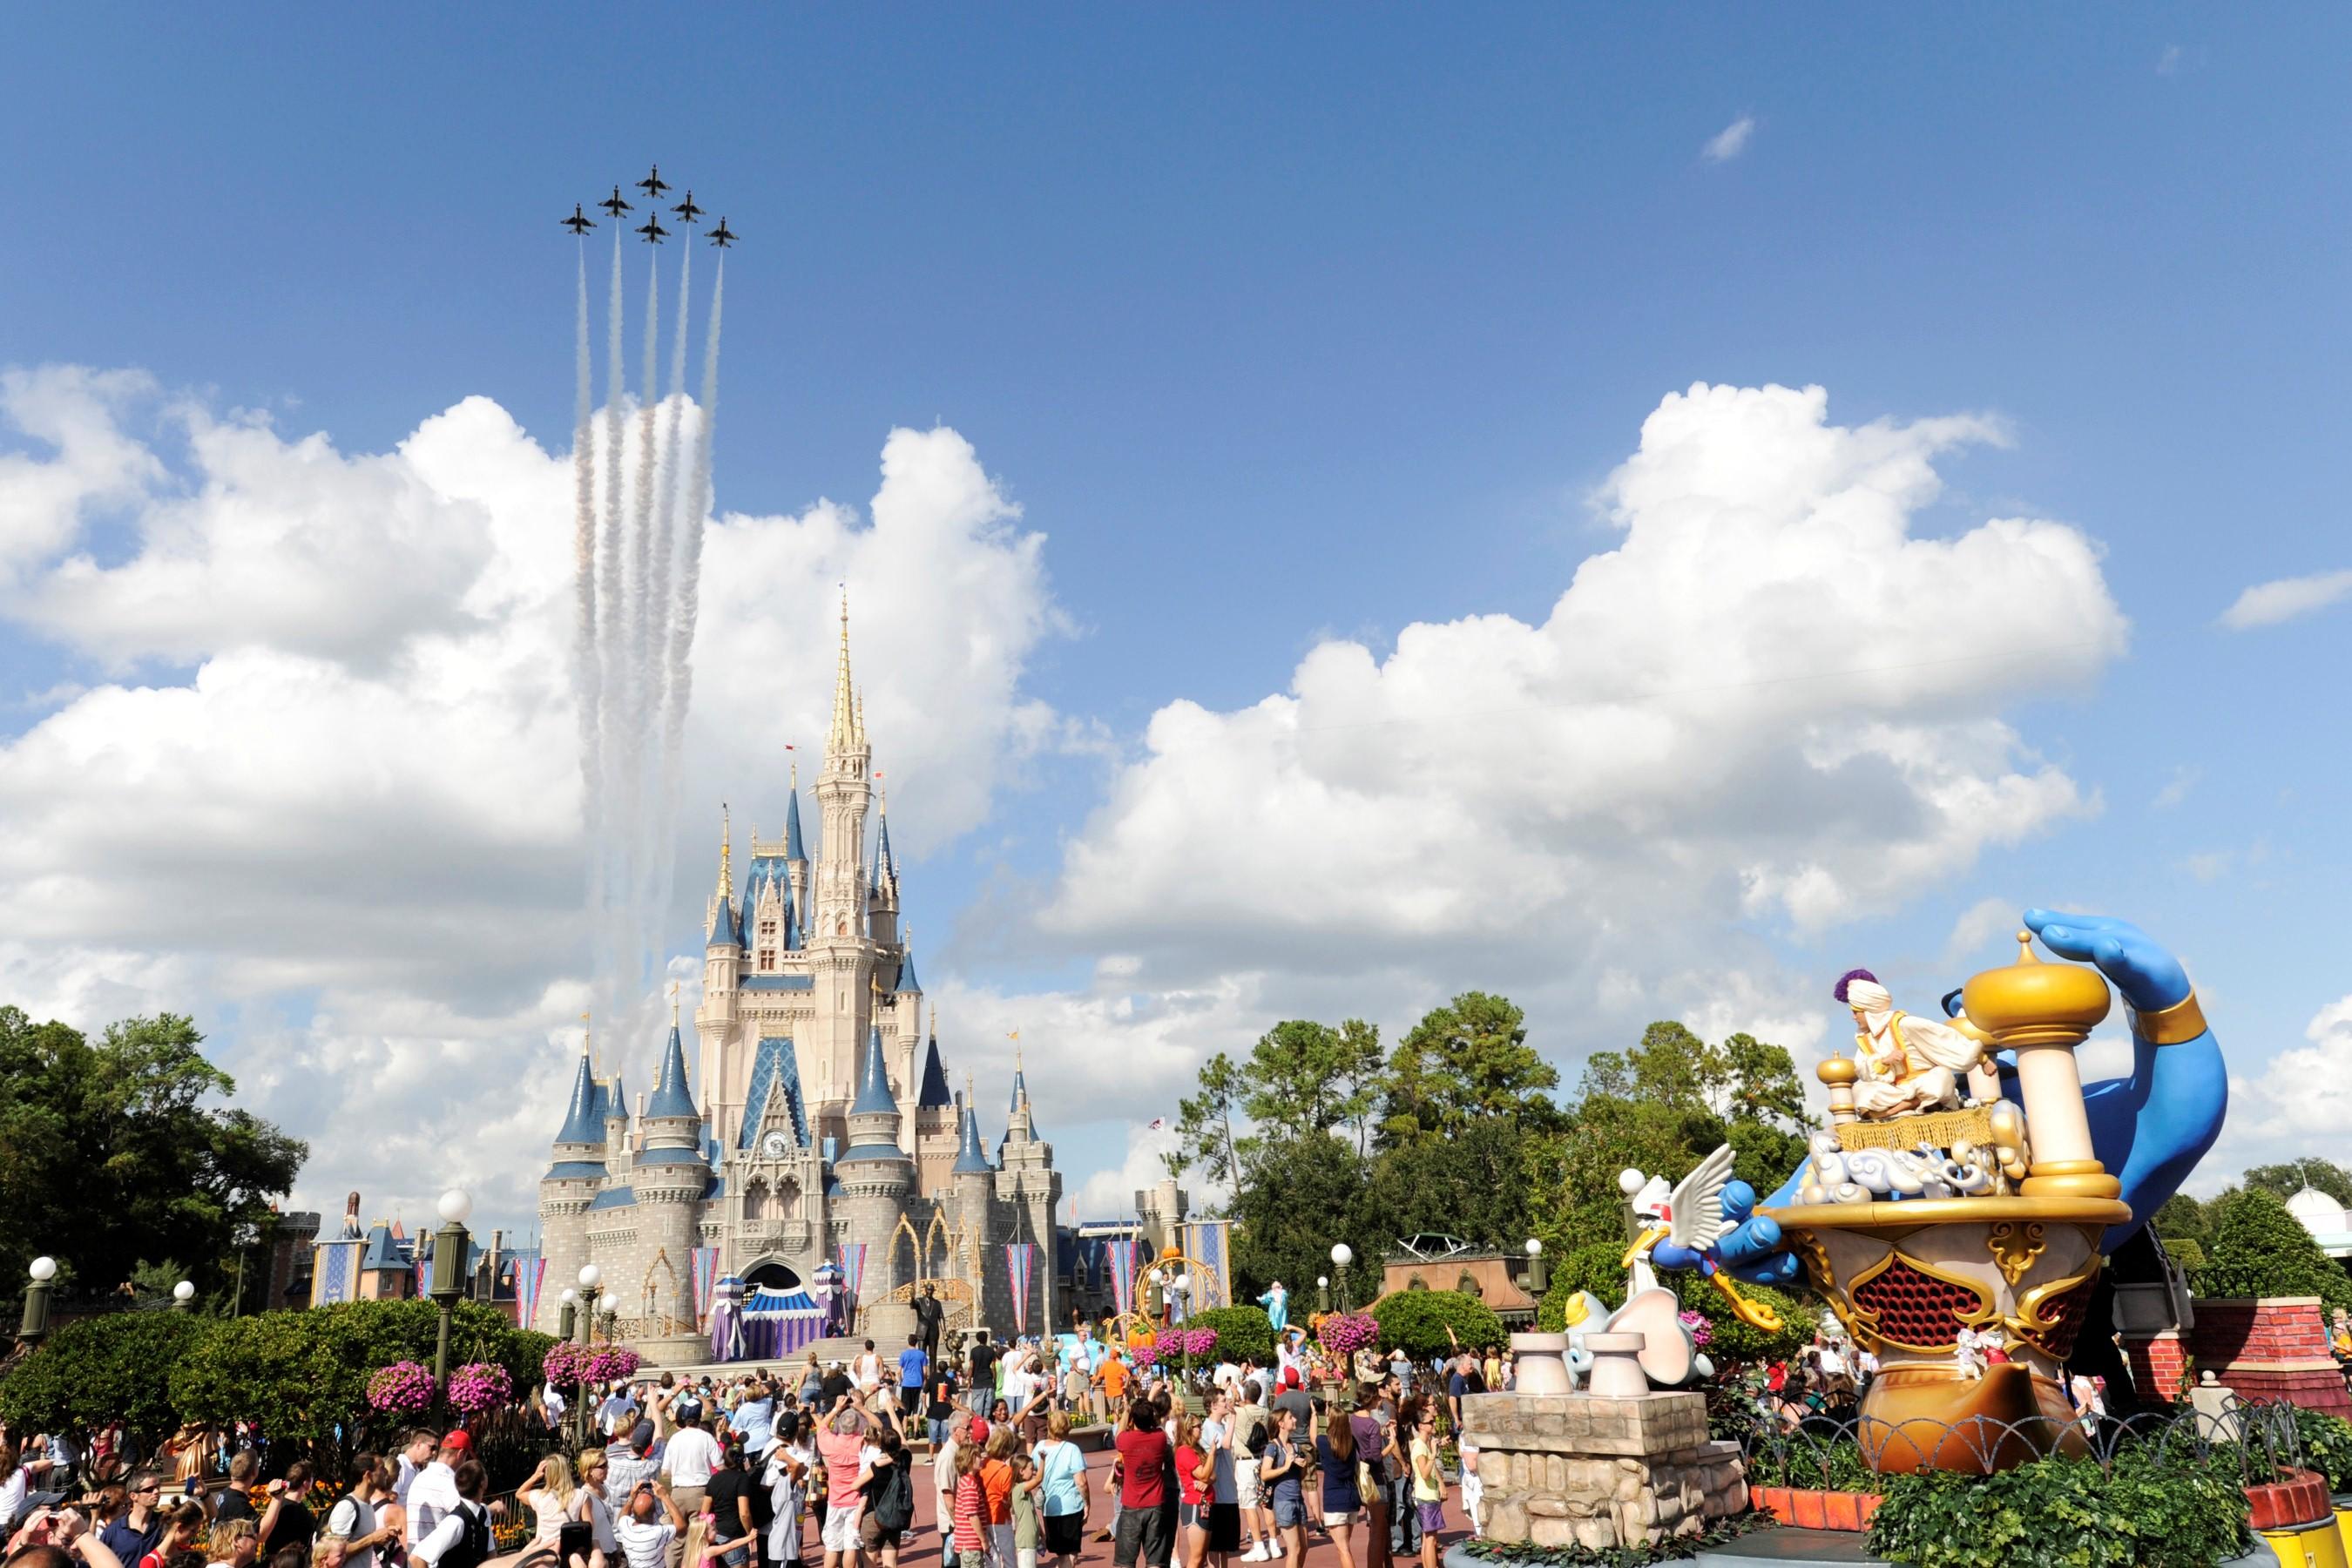 Walt Disney World Theme Park In Florida Us Hd Wallpaper 2700x1800 Download Hd Wallpaper Wallpapertip